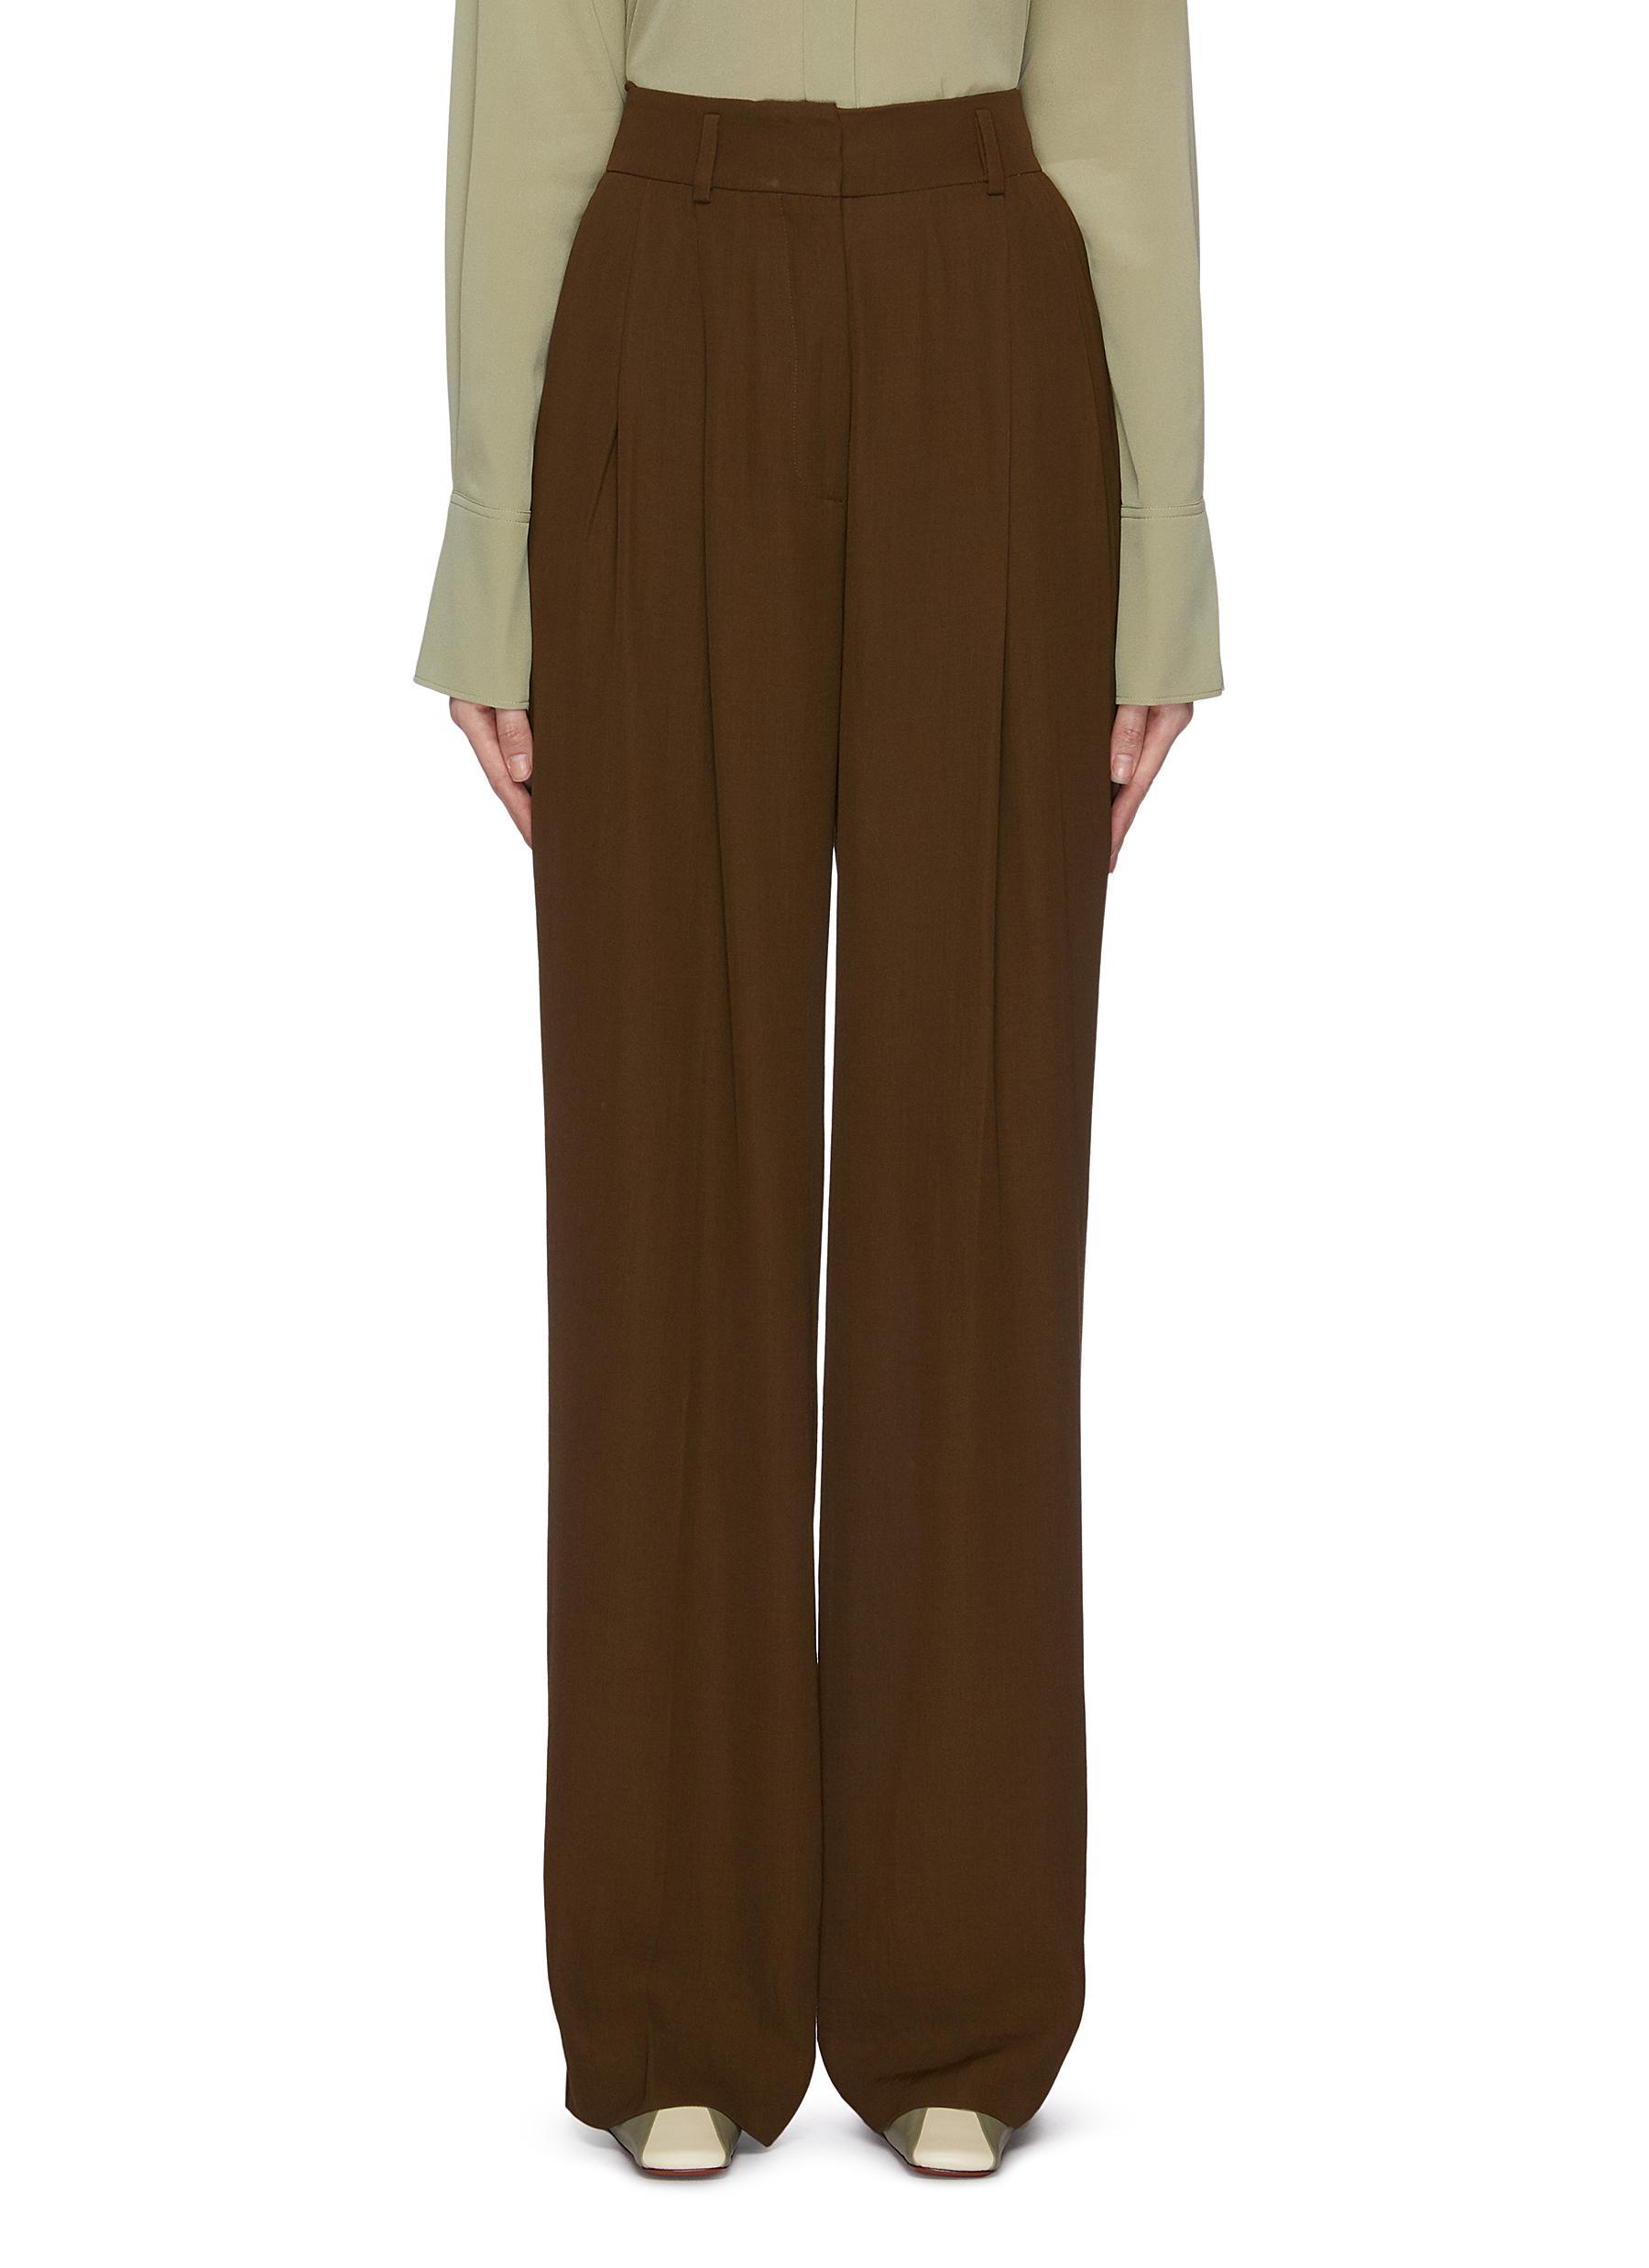 Buy Petar Petrov Pants & Shorts Double pleat wide leg pants